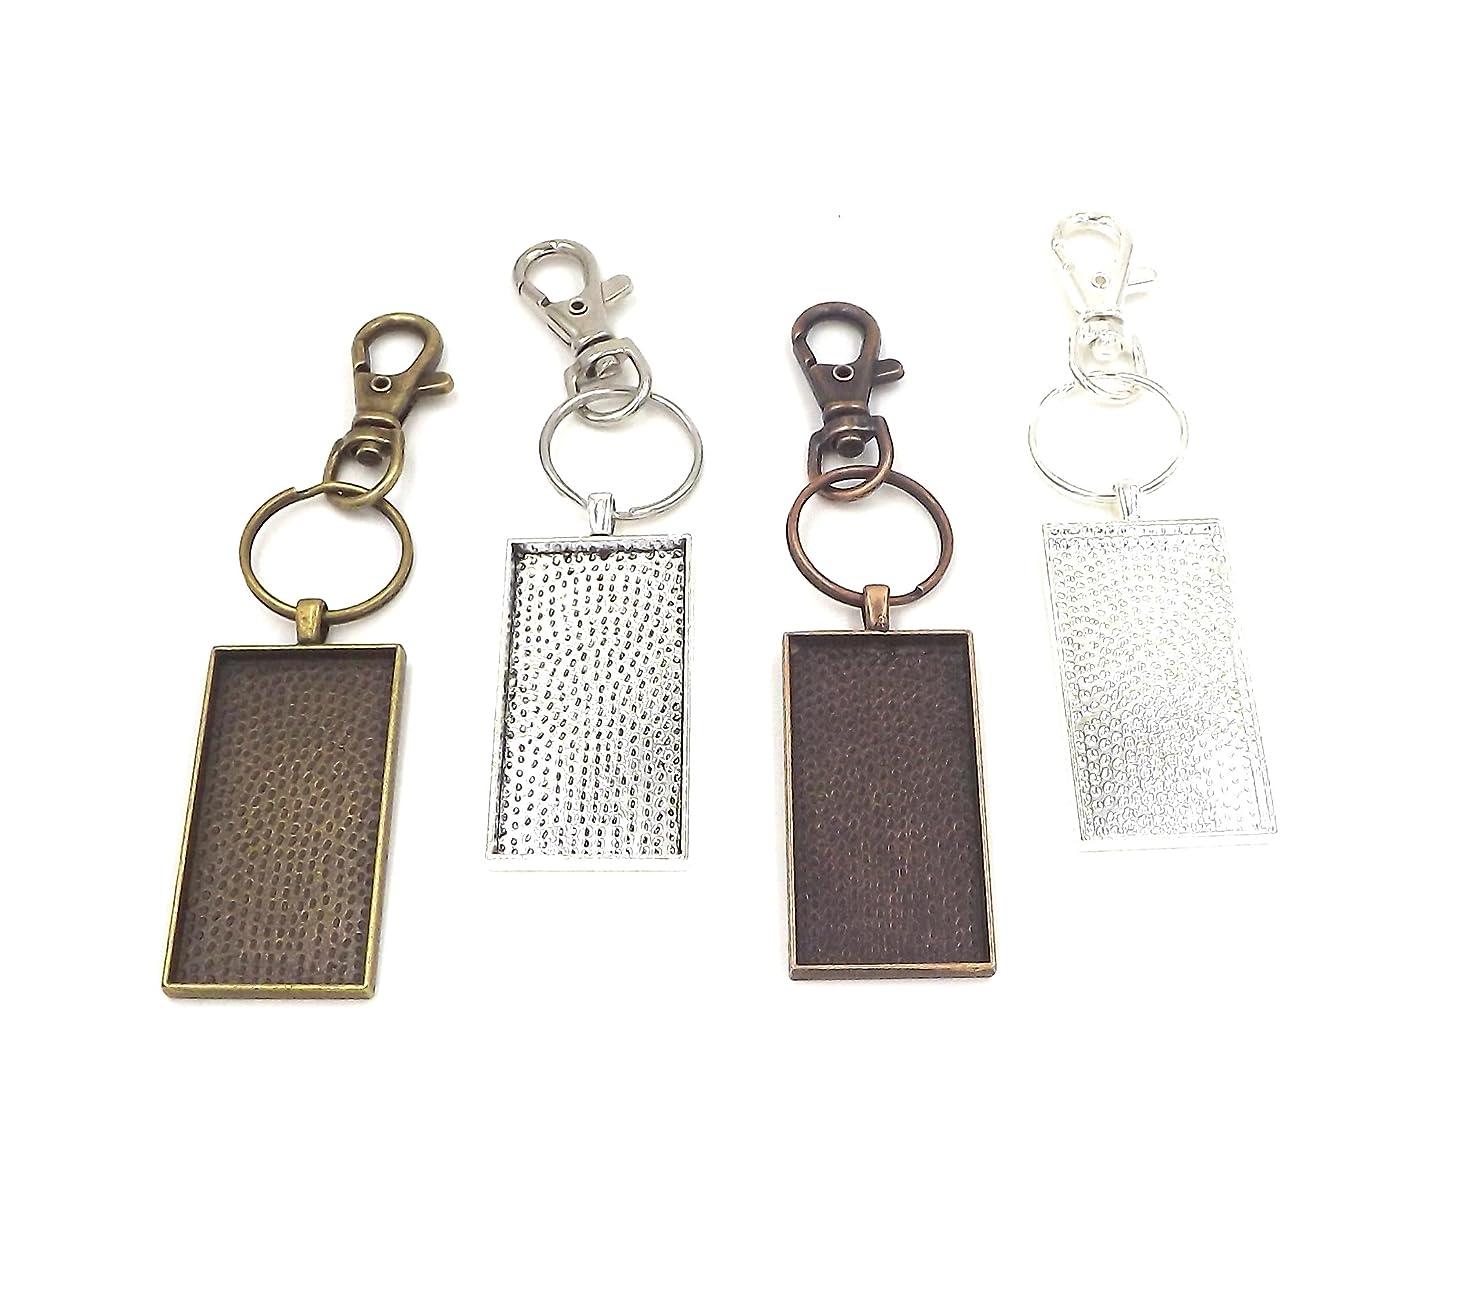 12 Deannassupplyshop 25X50mm rectangle Pendant Trays with key chain - Multicolor - 25X50mm- Pendant Blanks Cameo Bezel Settings Photo Jewelry - Custom Jewelry Making